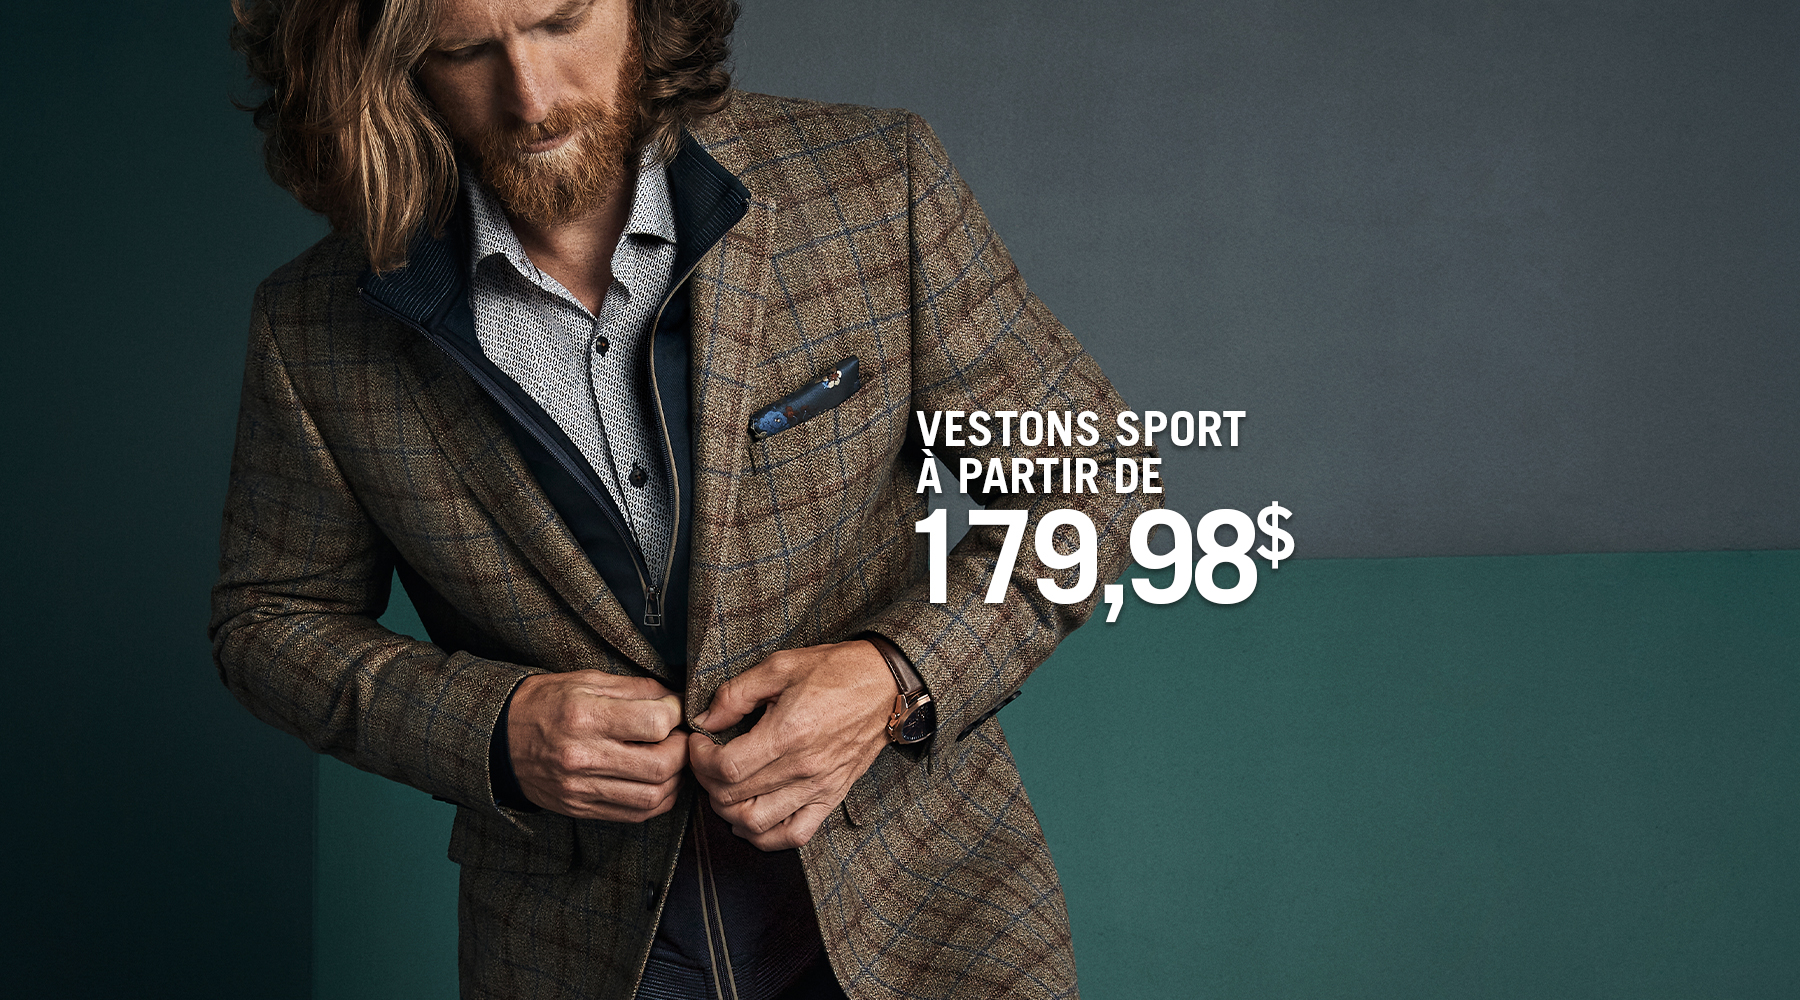 Vestons Sport 179,98$